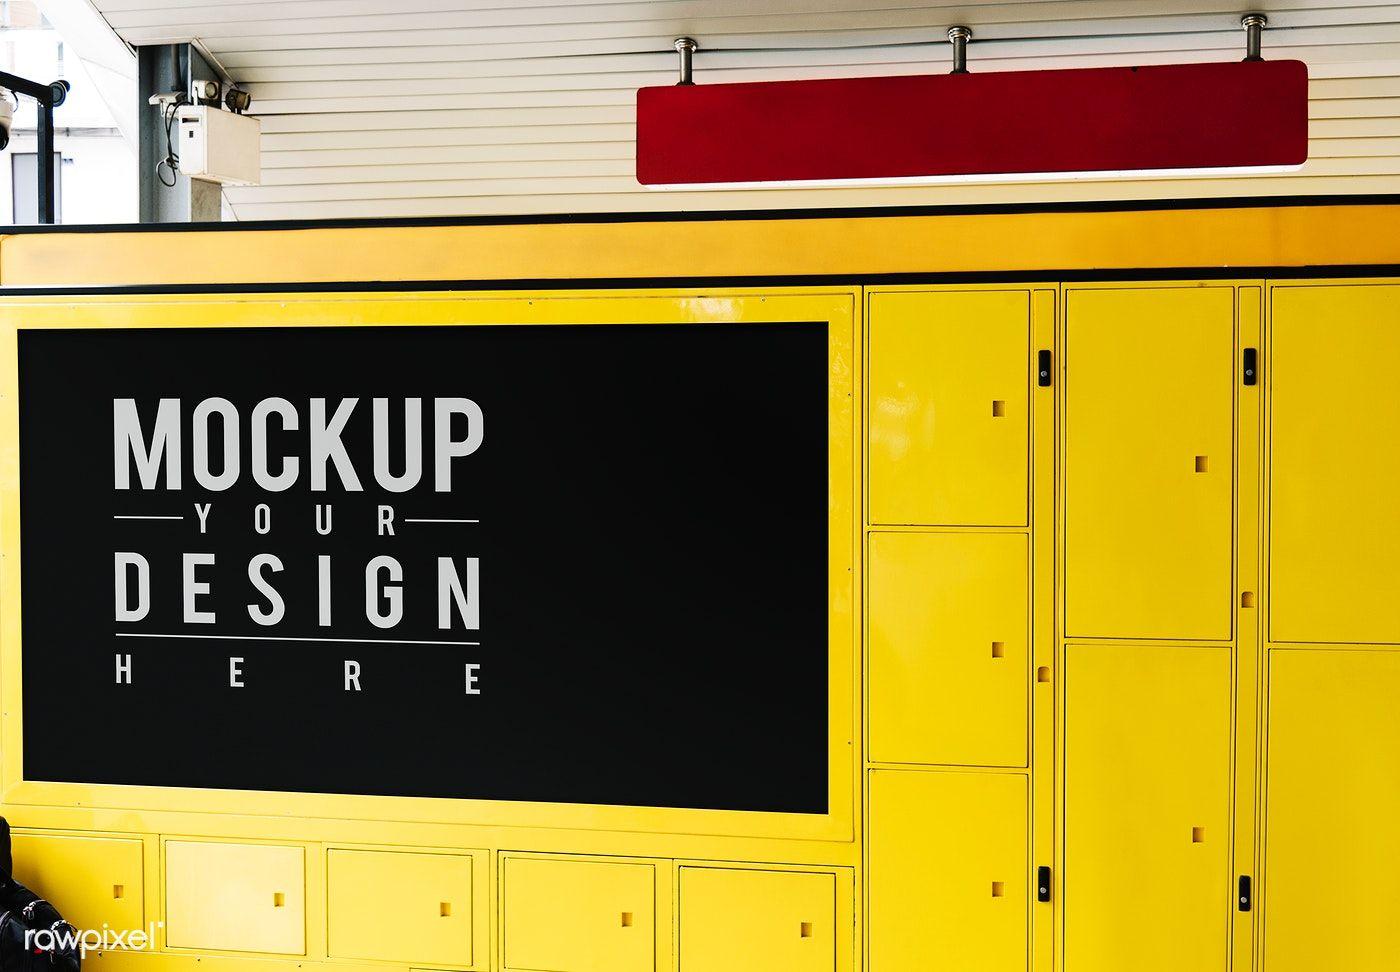 Hanging Red Sign Mockup Above Yellow Luggage Locker Free Image